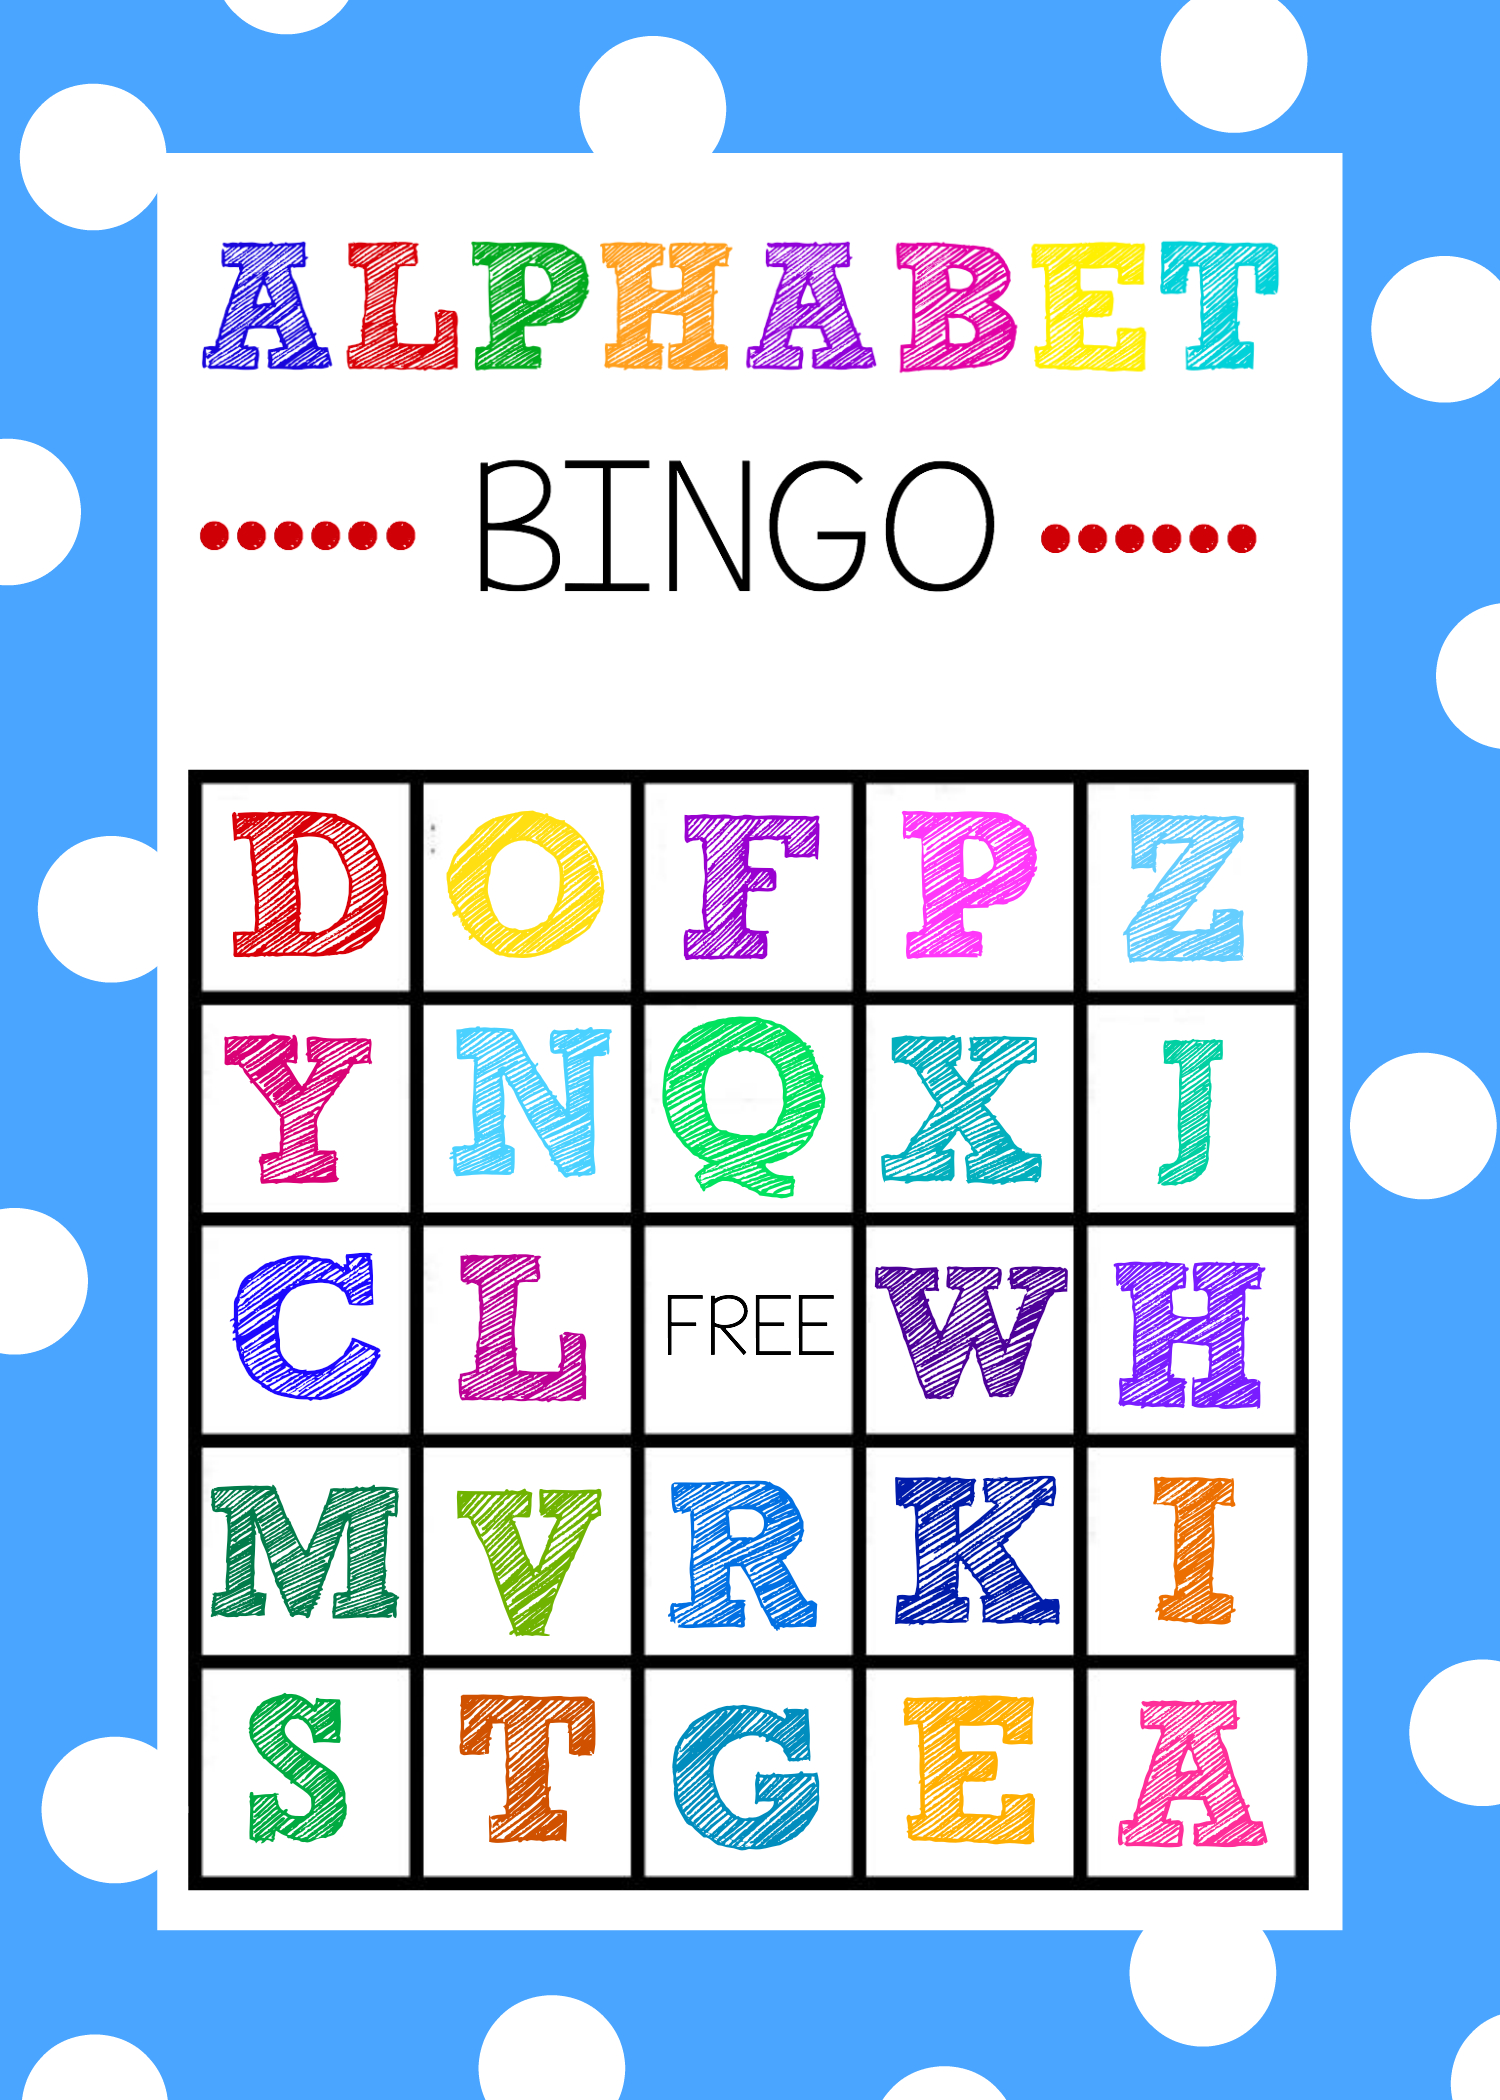 Free Alphabet Bingo Boards. Such A Fun Abc Game For Kids!   Abc - Free Printable Alphabet Board Games